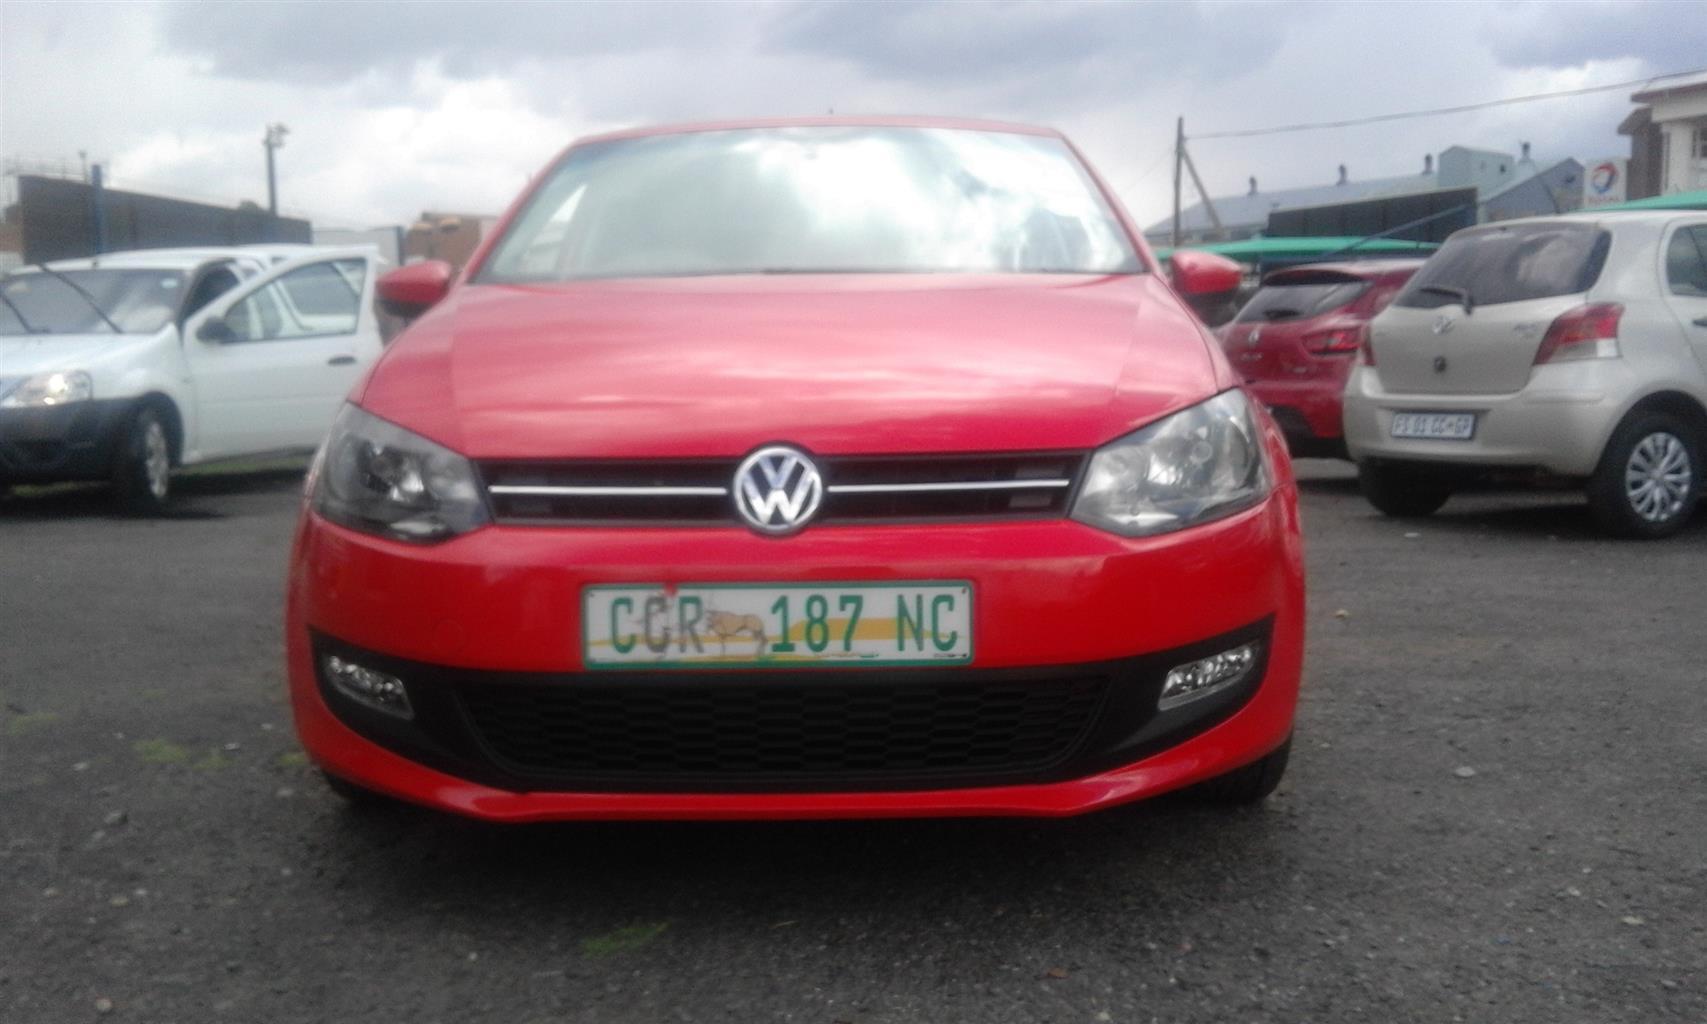 Polo For Sale In Gauteng R30000 | ANLIS